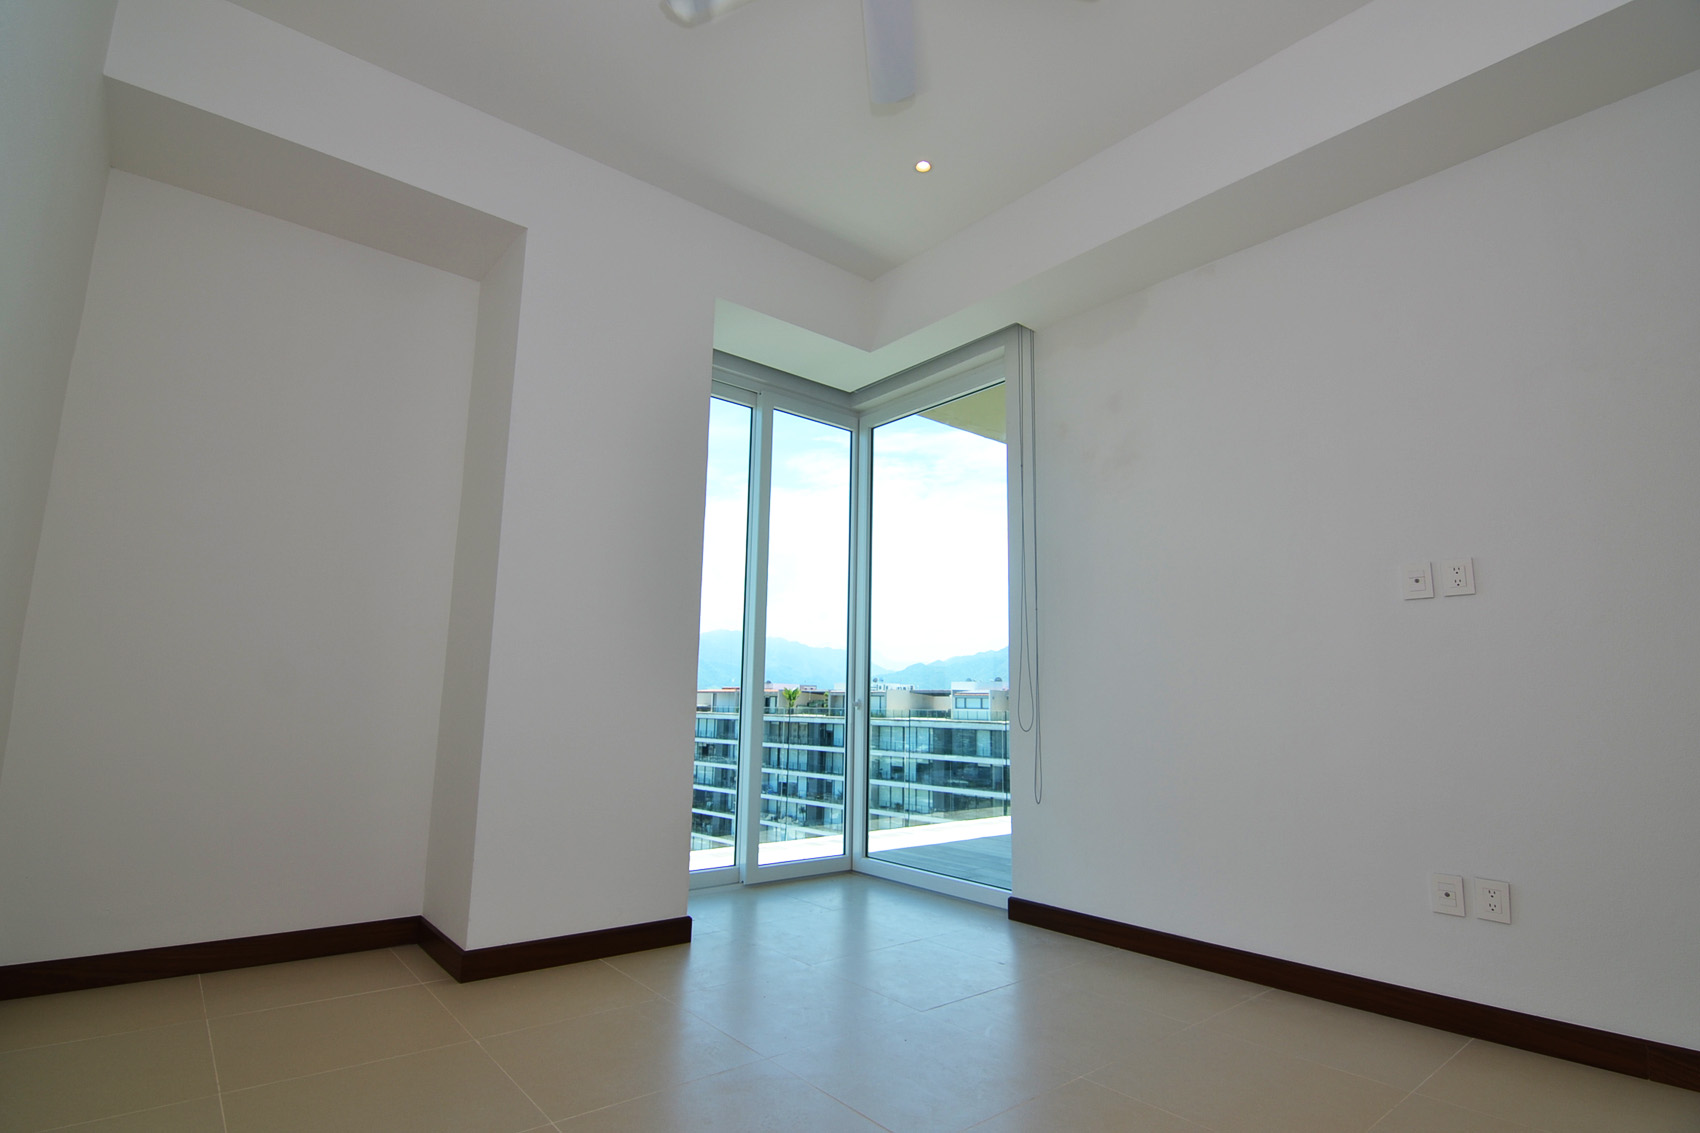 Condo VMarina PH10 - Puerto Vallarta Luxury Condo For Rent (64)